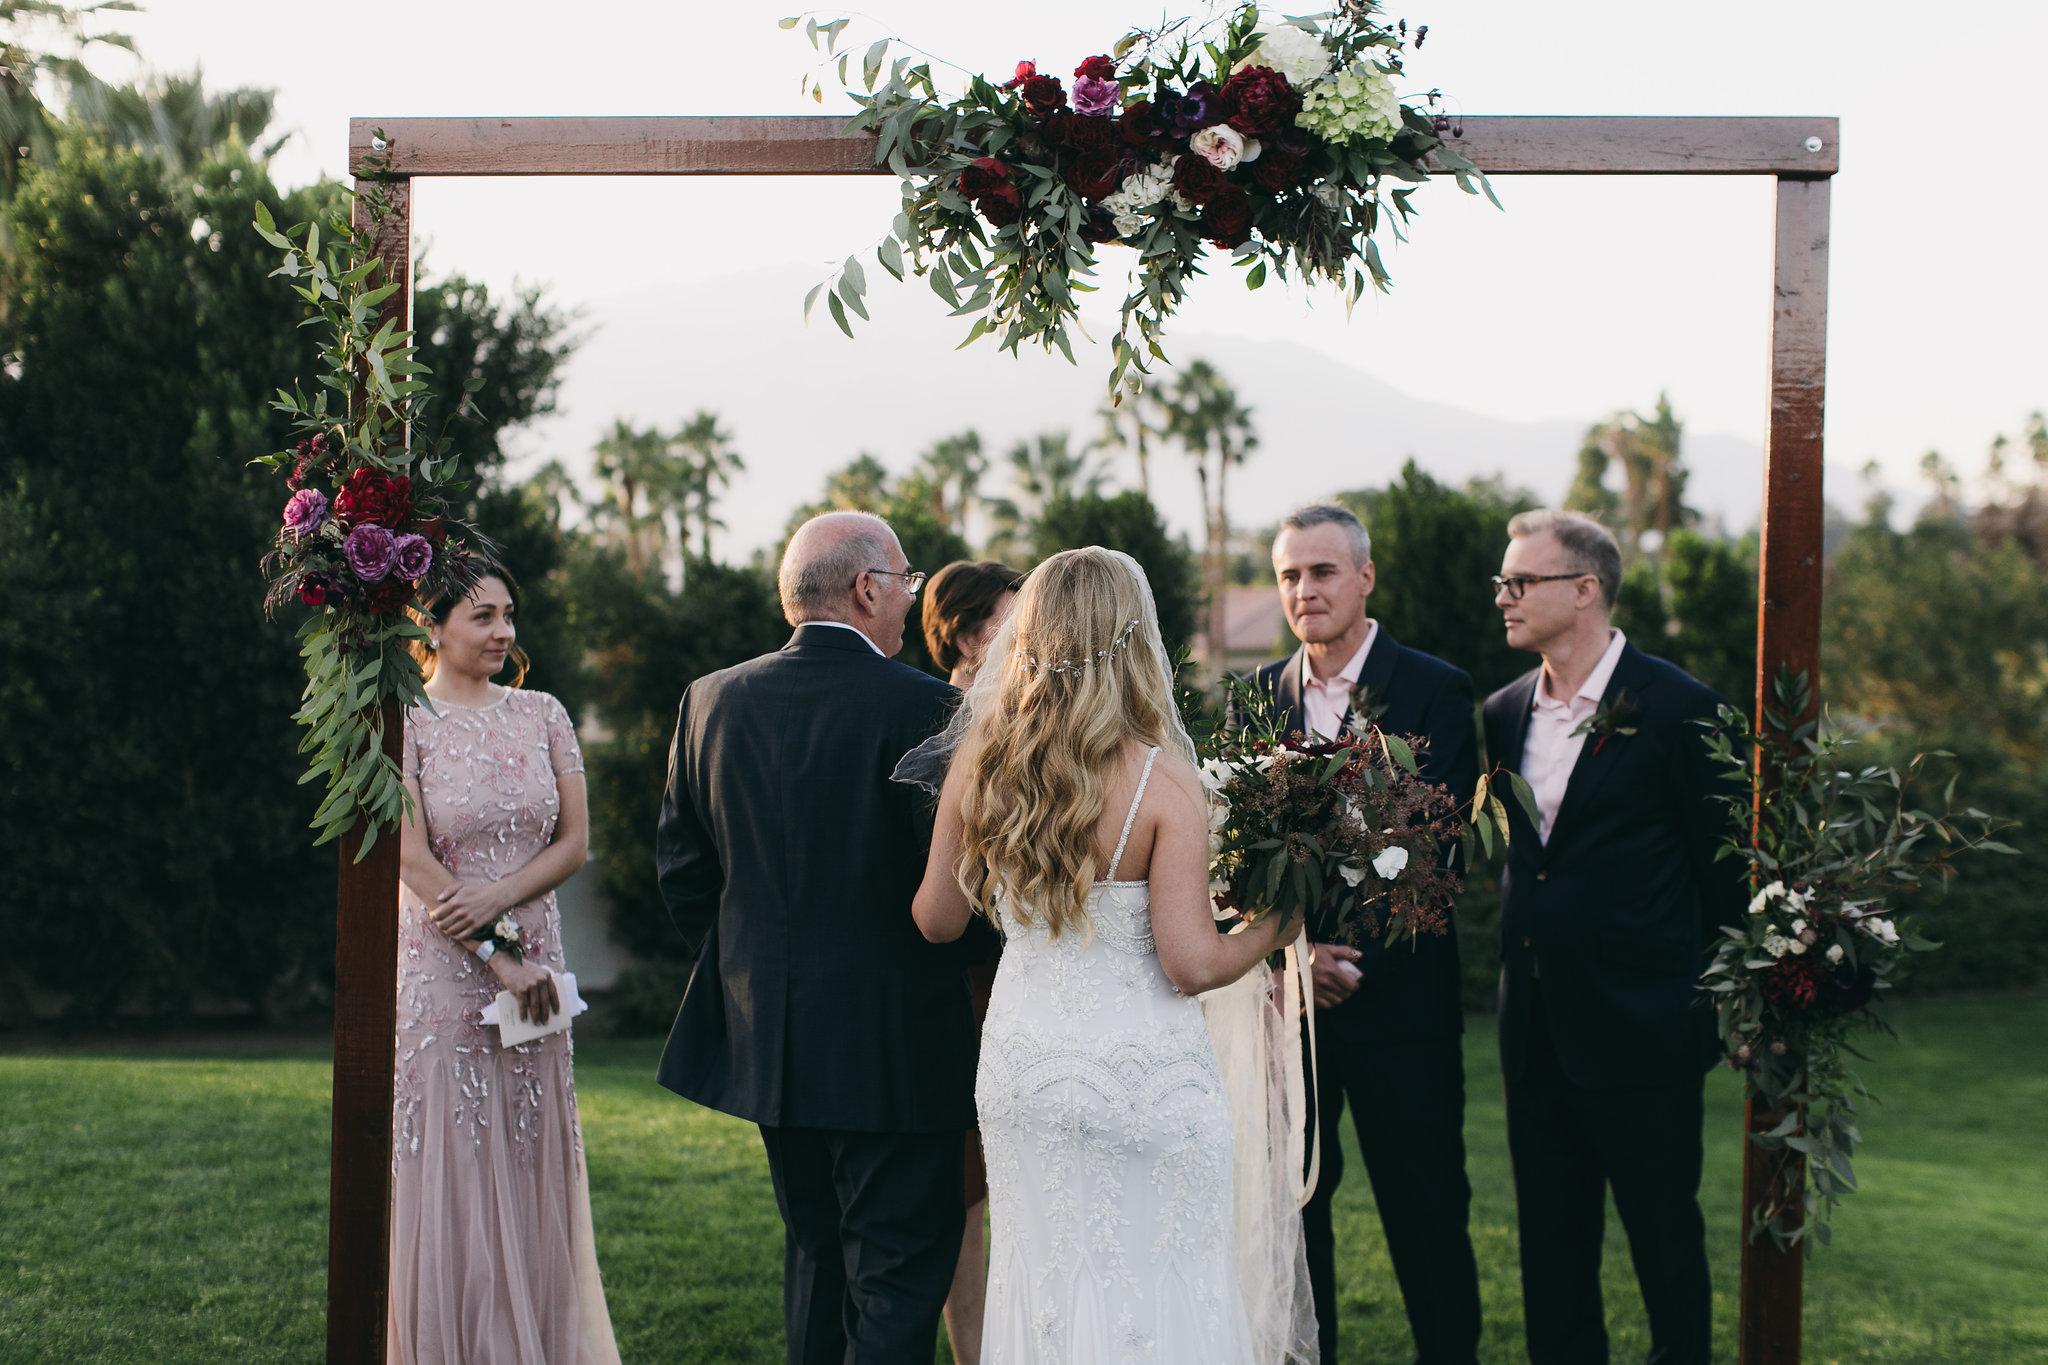 Gracy-Andrew-Wedding-440.jpg